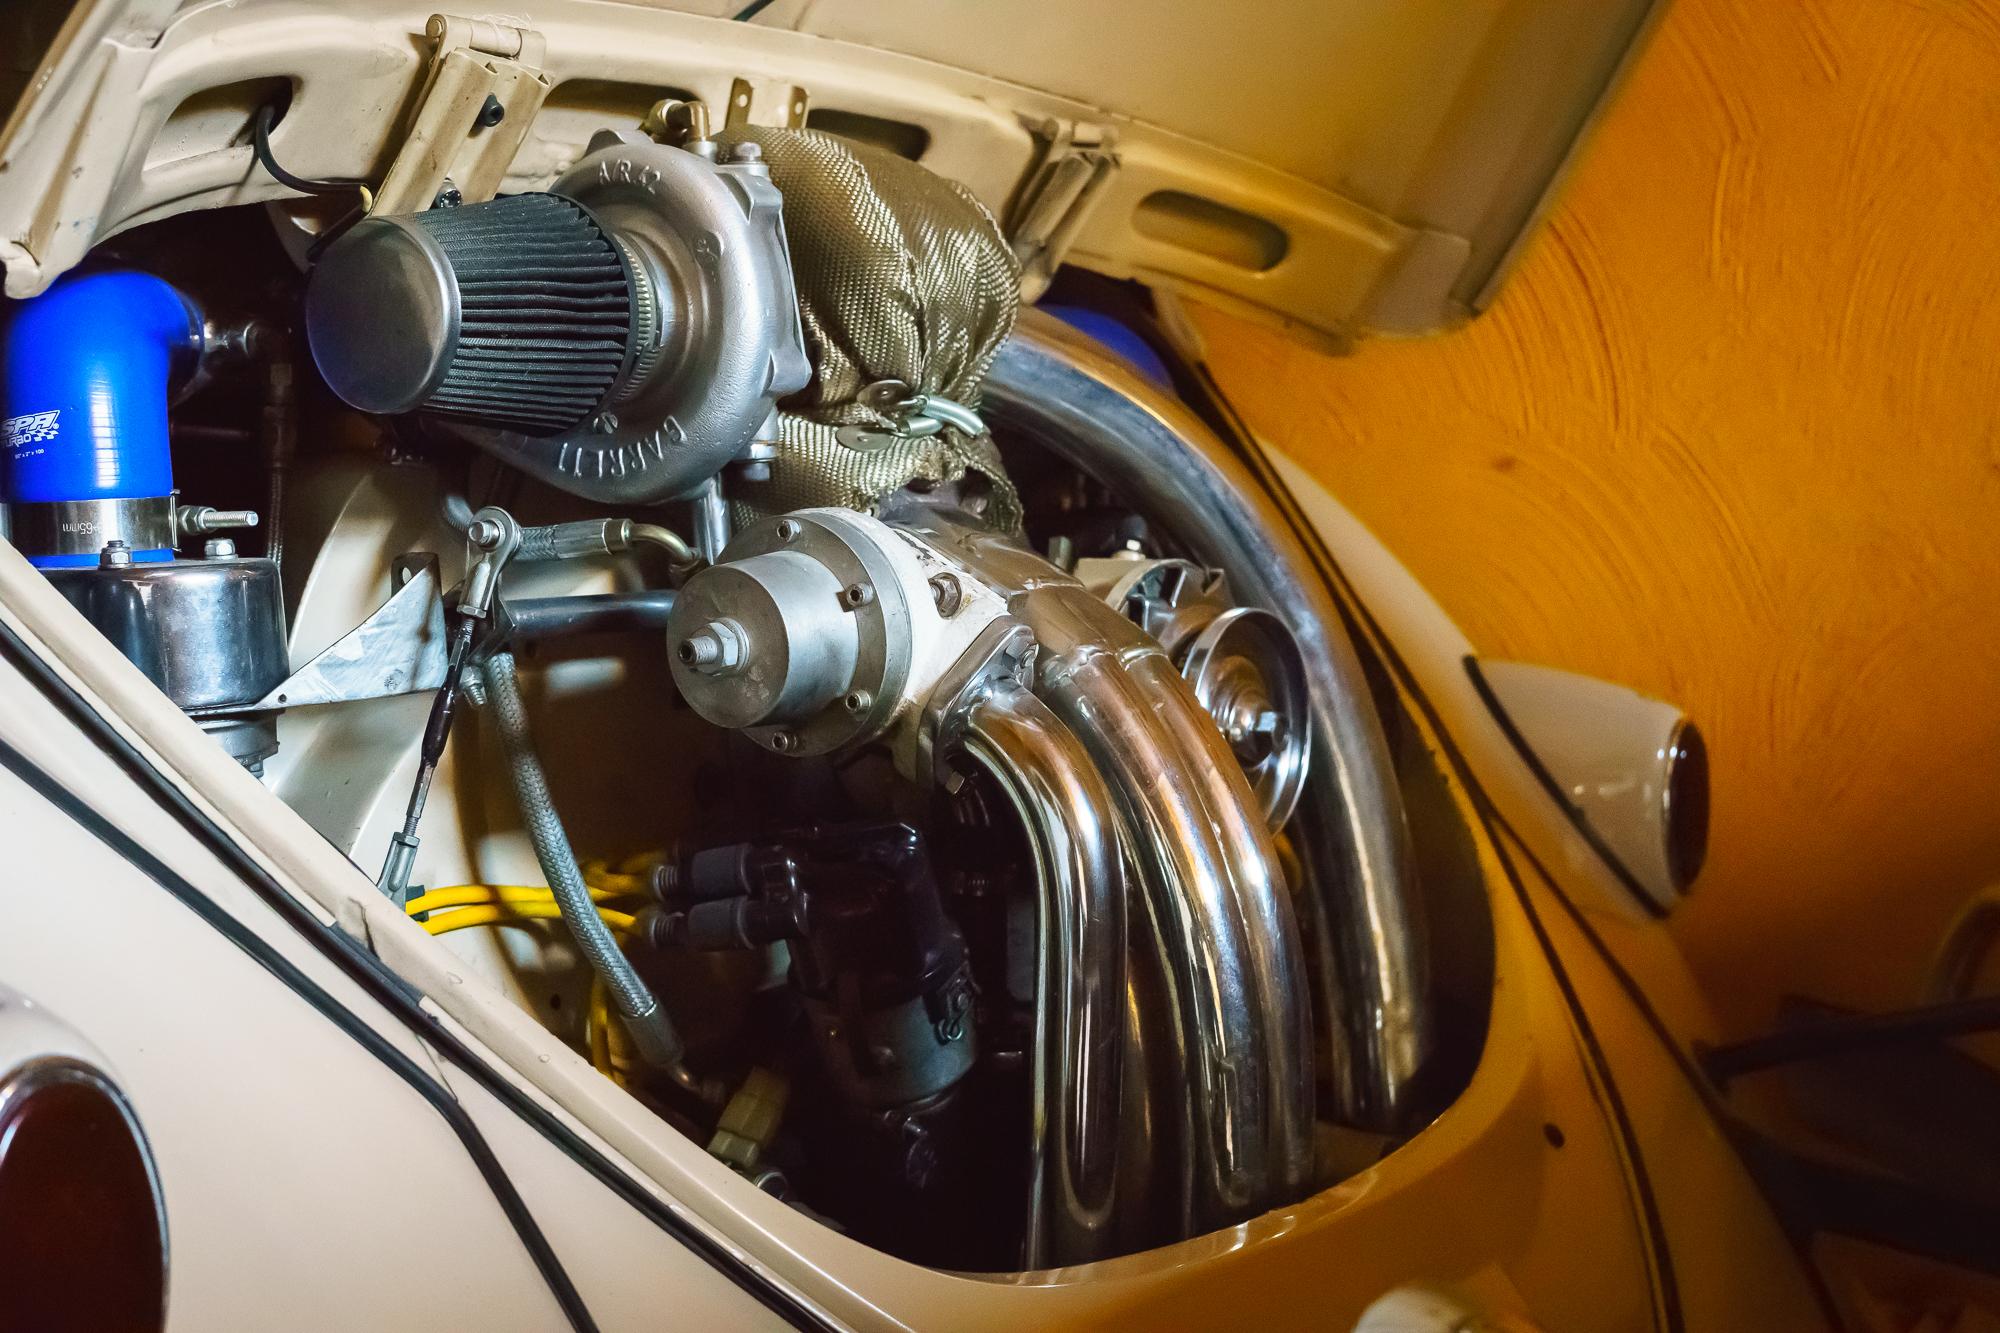 Turbocharged classic Beetle